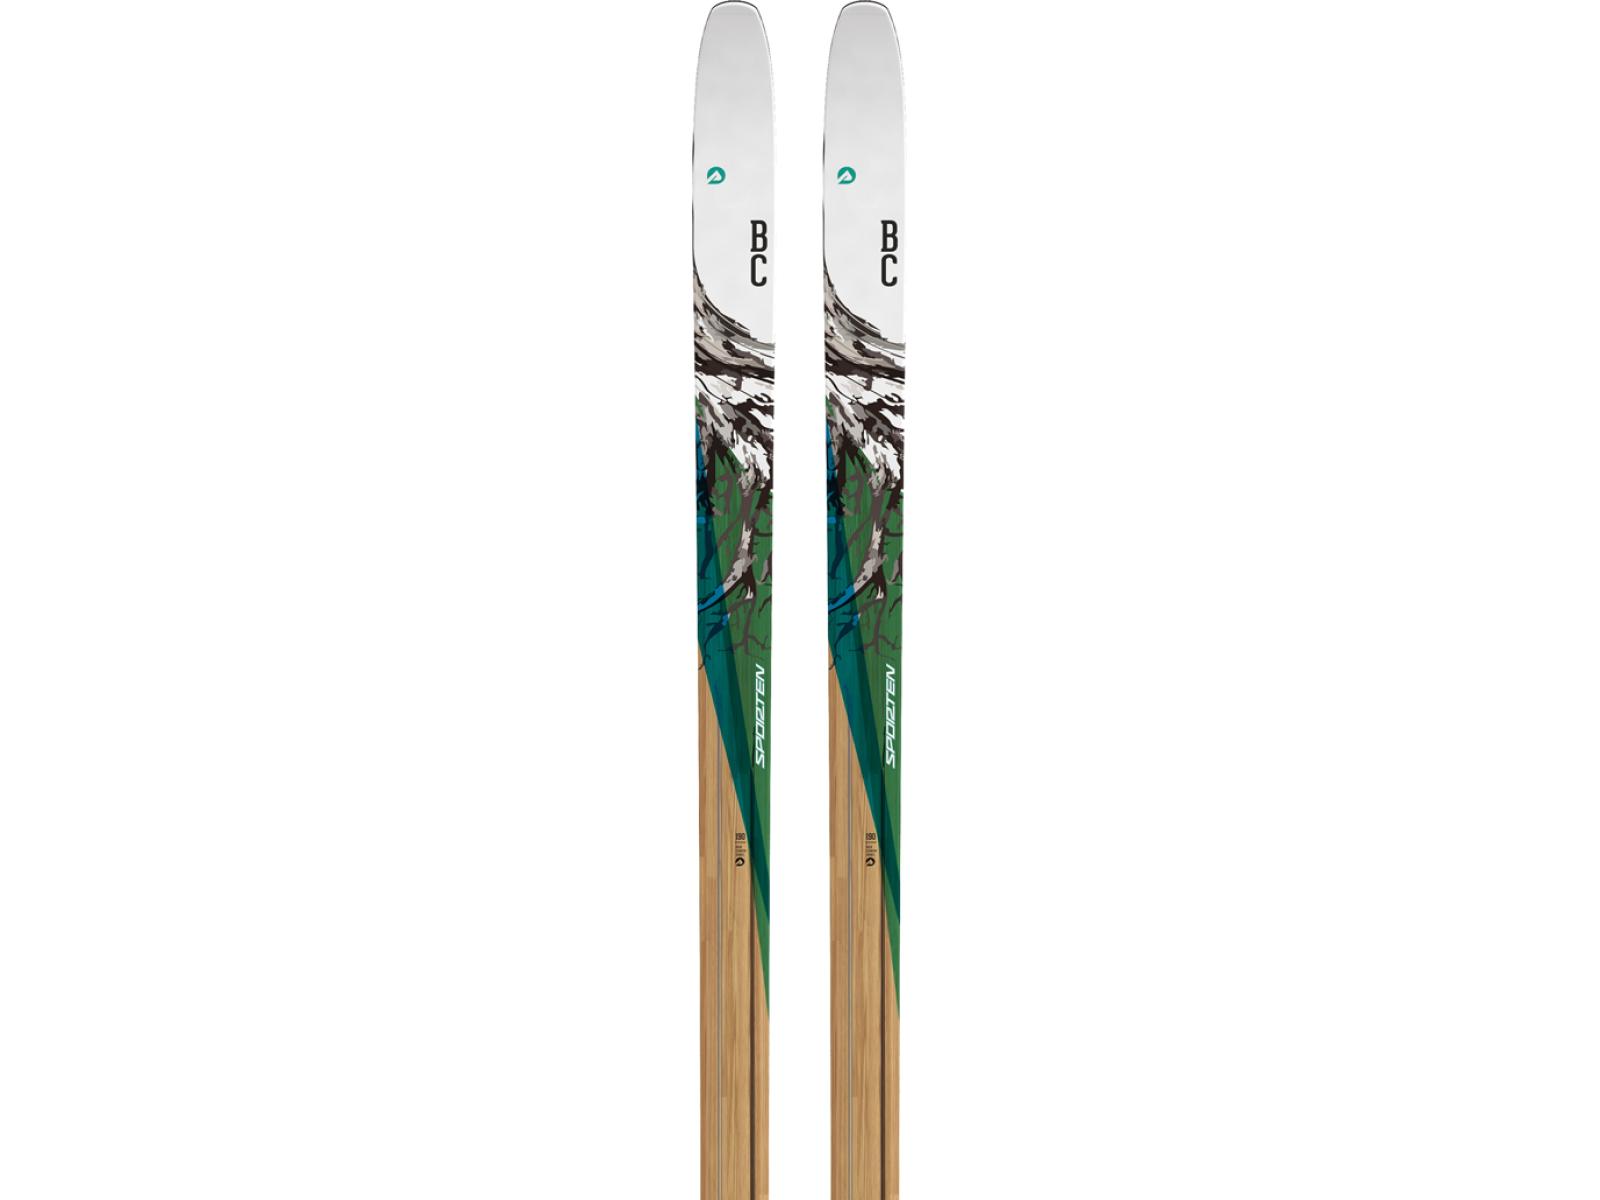 Sporten Ranger - lisovaný protismyk Délka: 160 cm 2019/2020